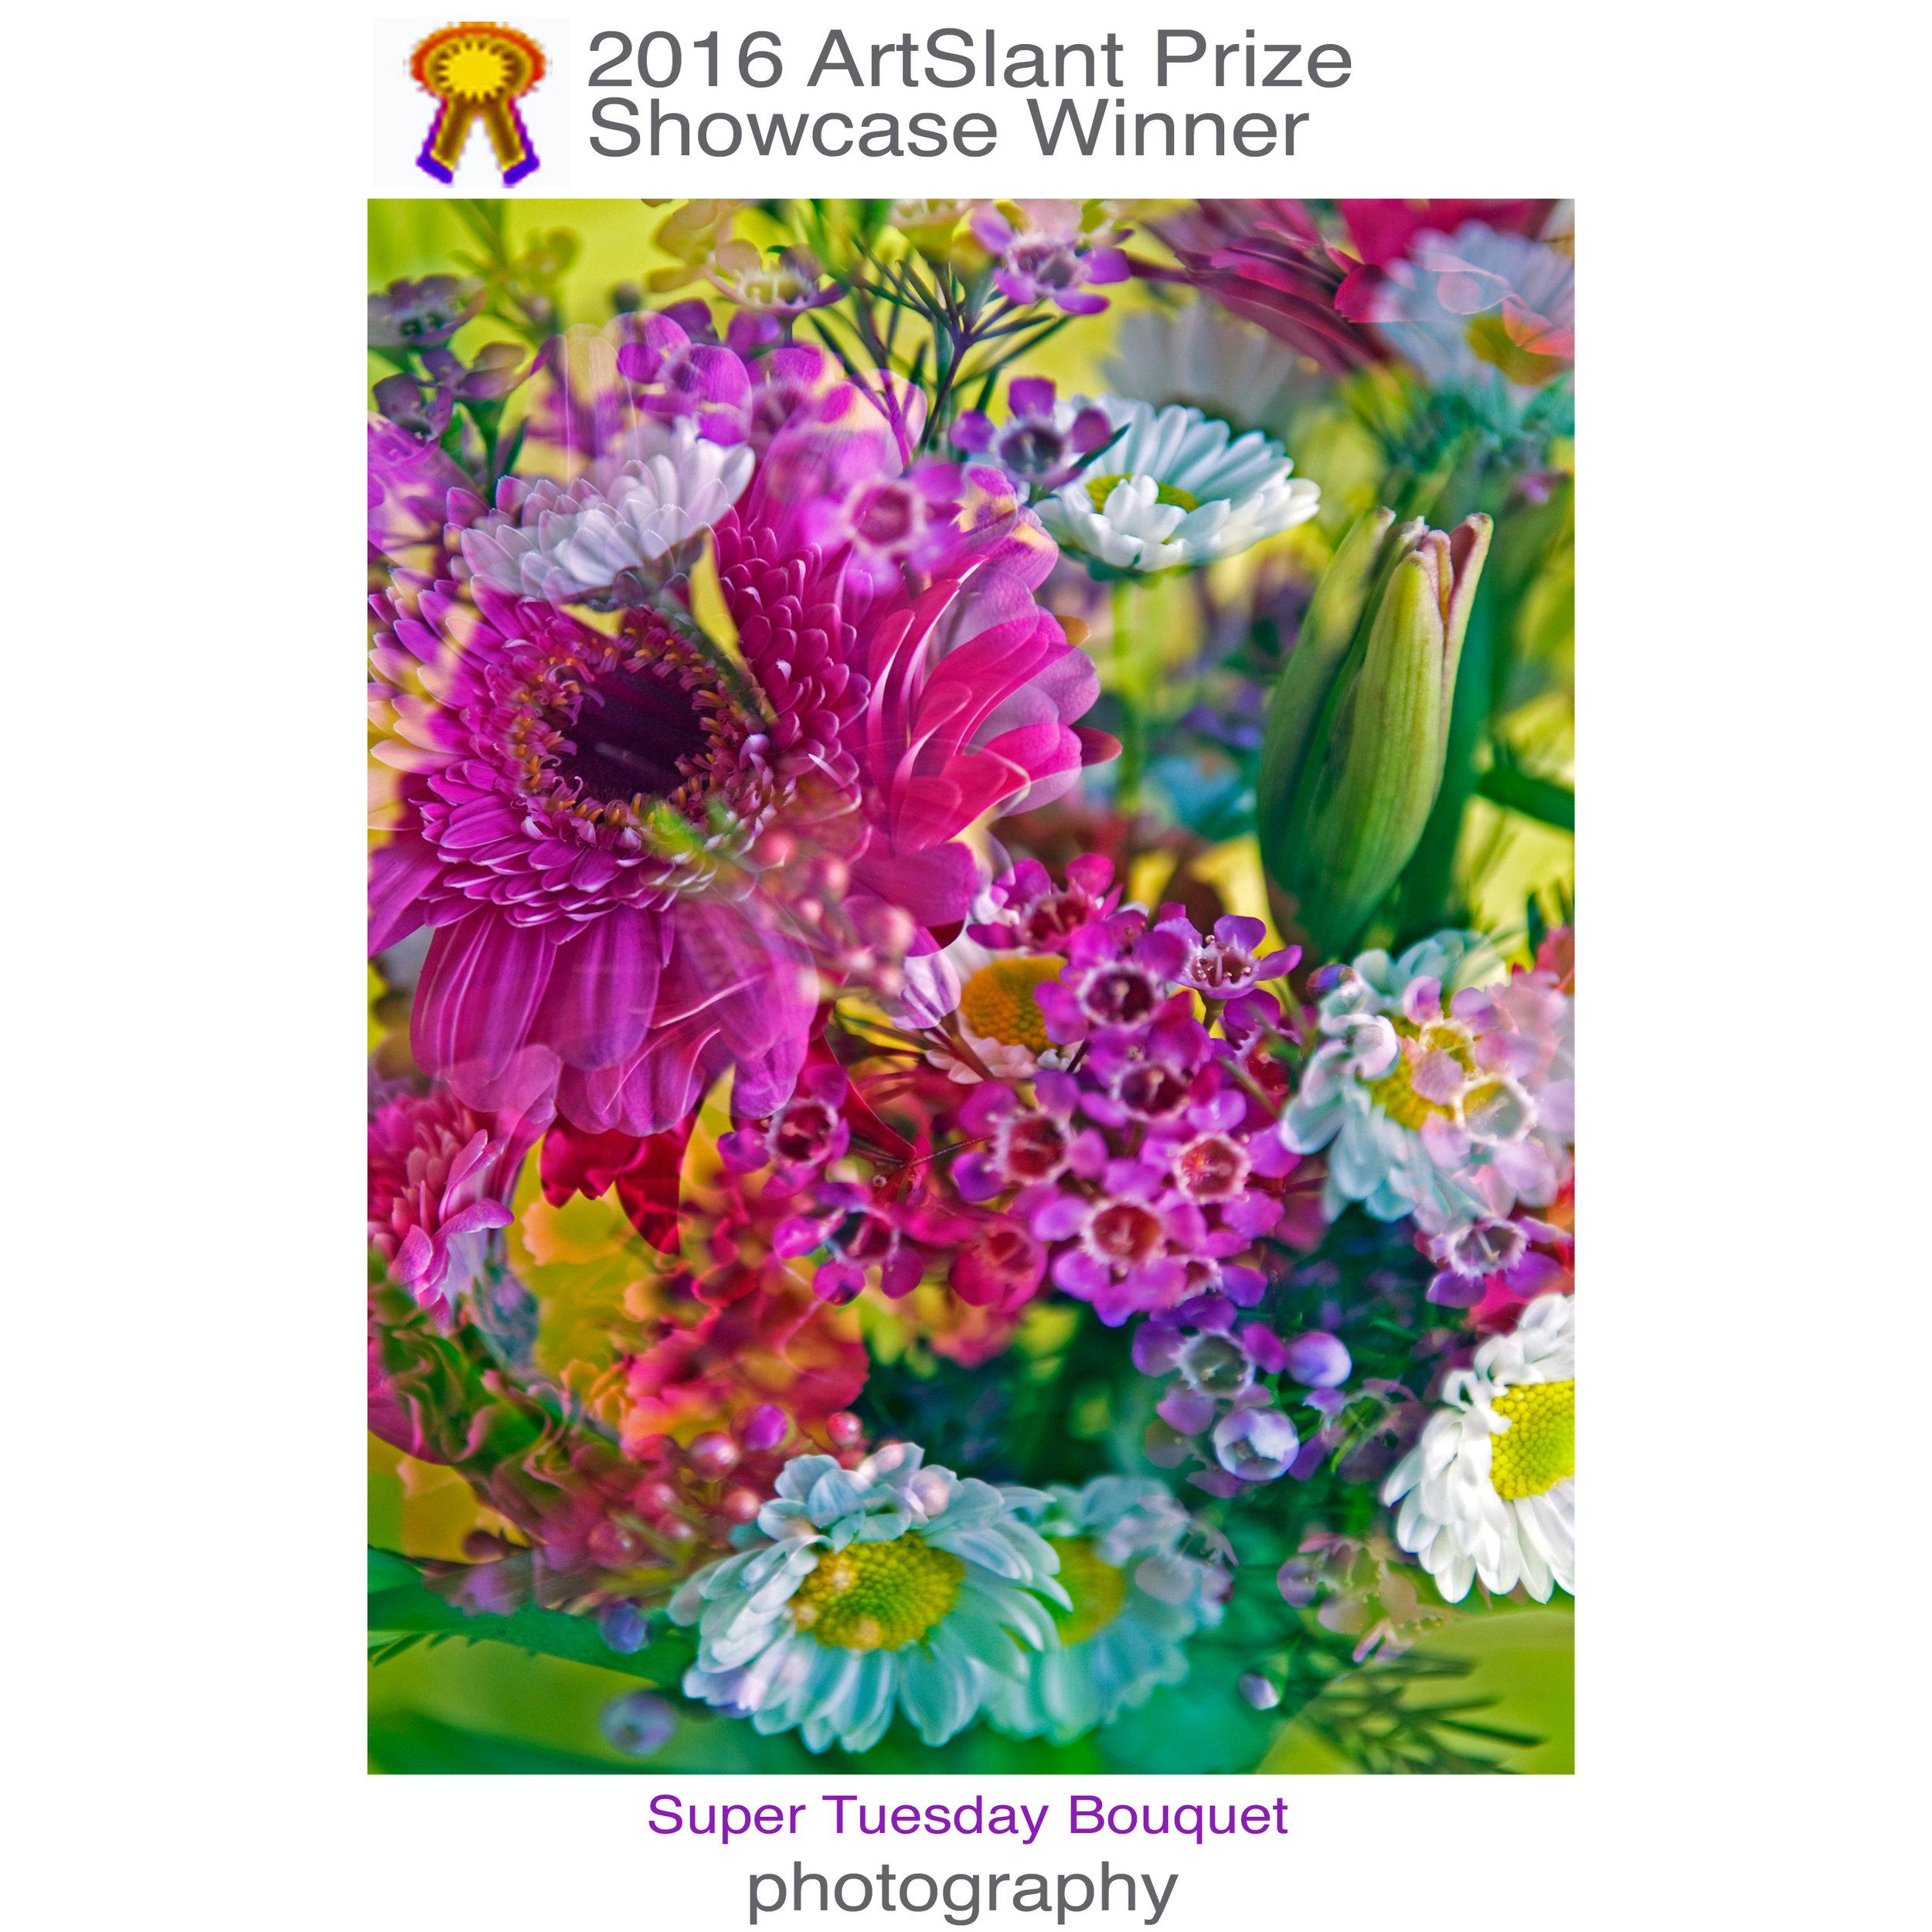 The original image SUPER TUESDAY BOUQUET won an ArtSlant Award